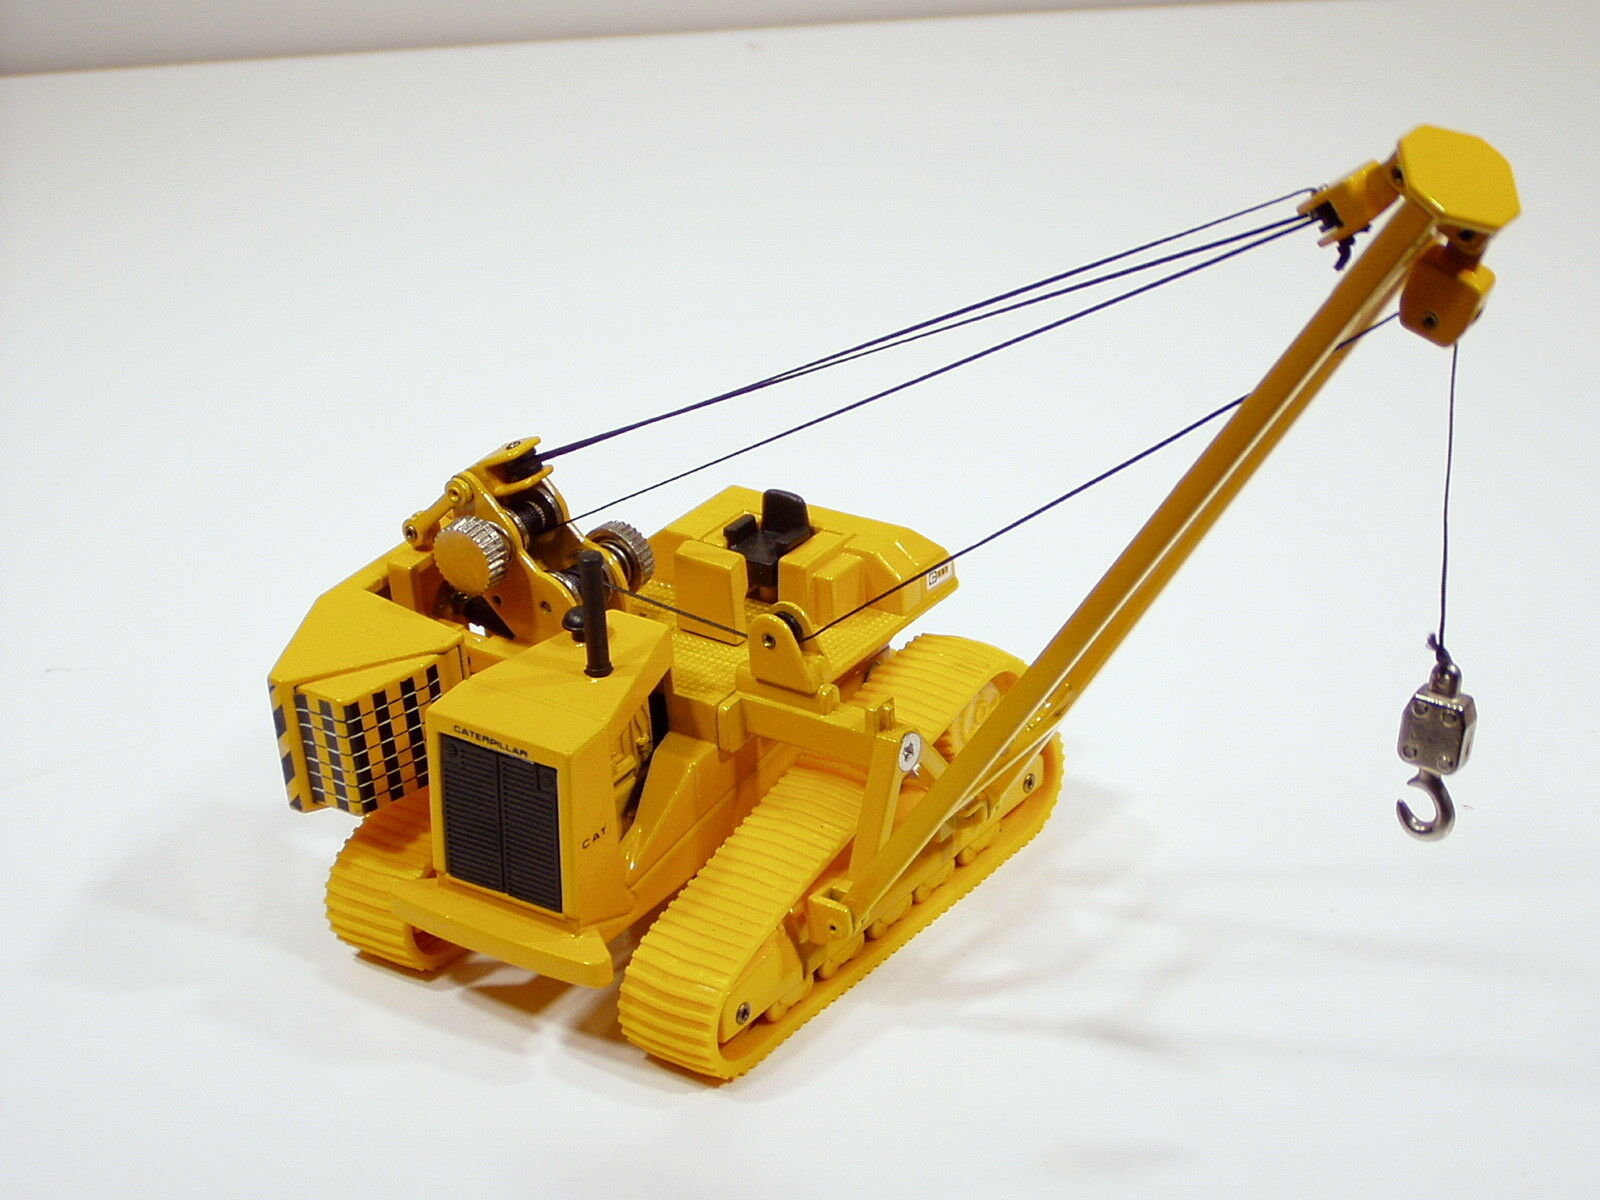 Caterpillar 591 Pipelayer - o c - 1 50 - Joal  224 - MIB